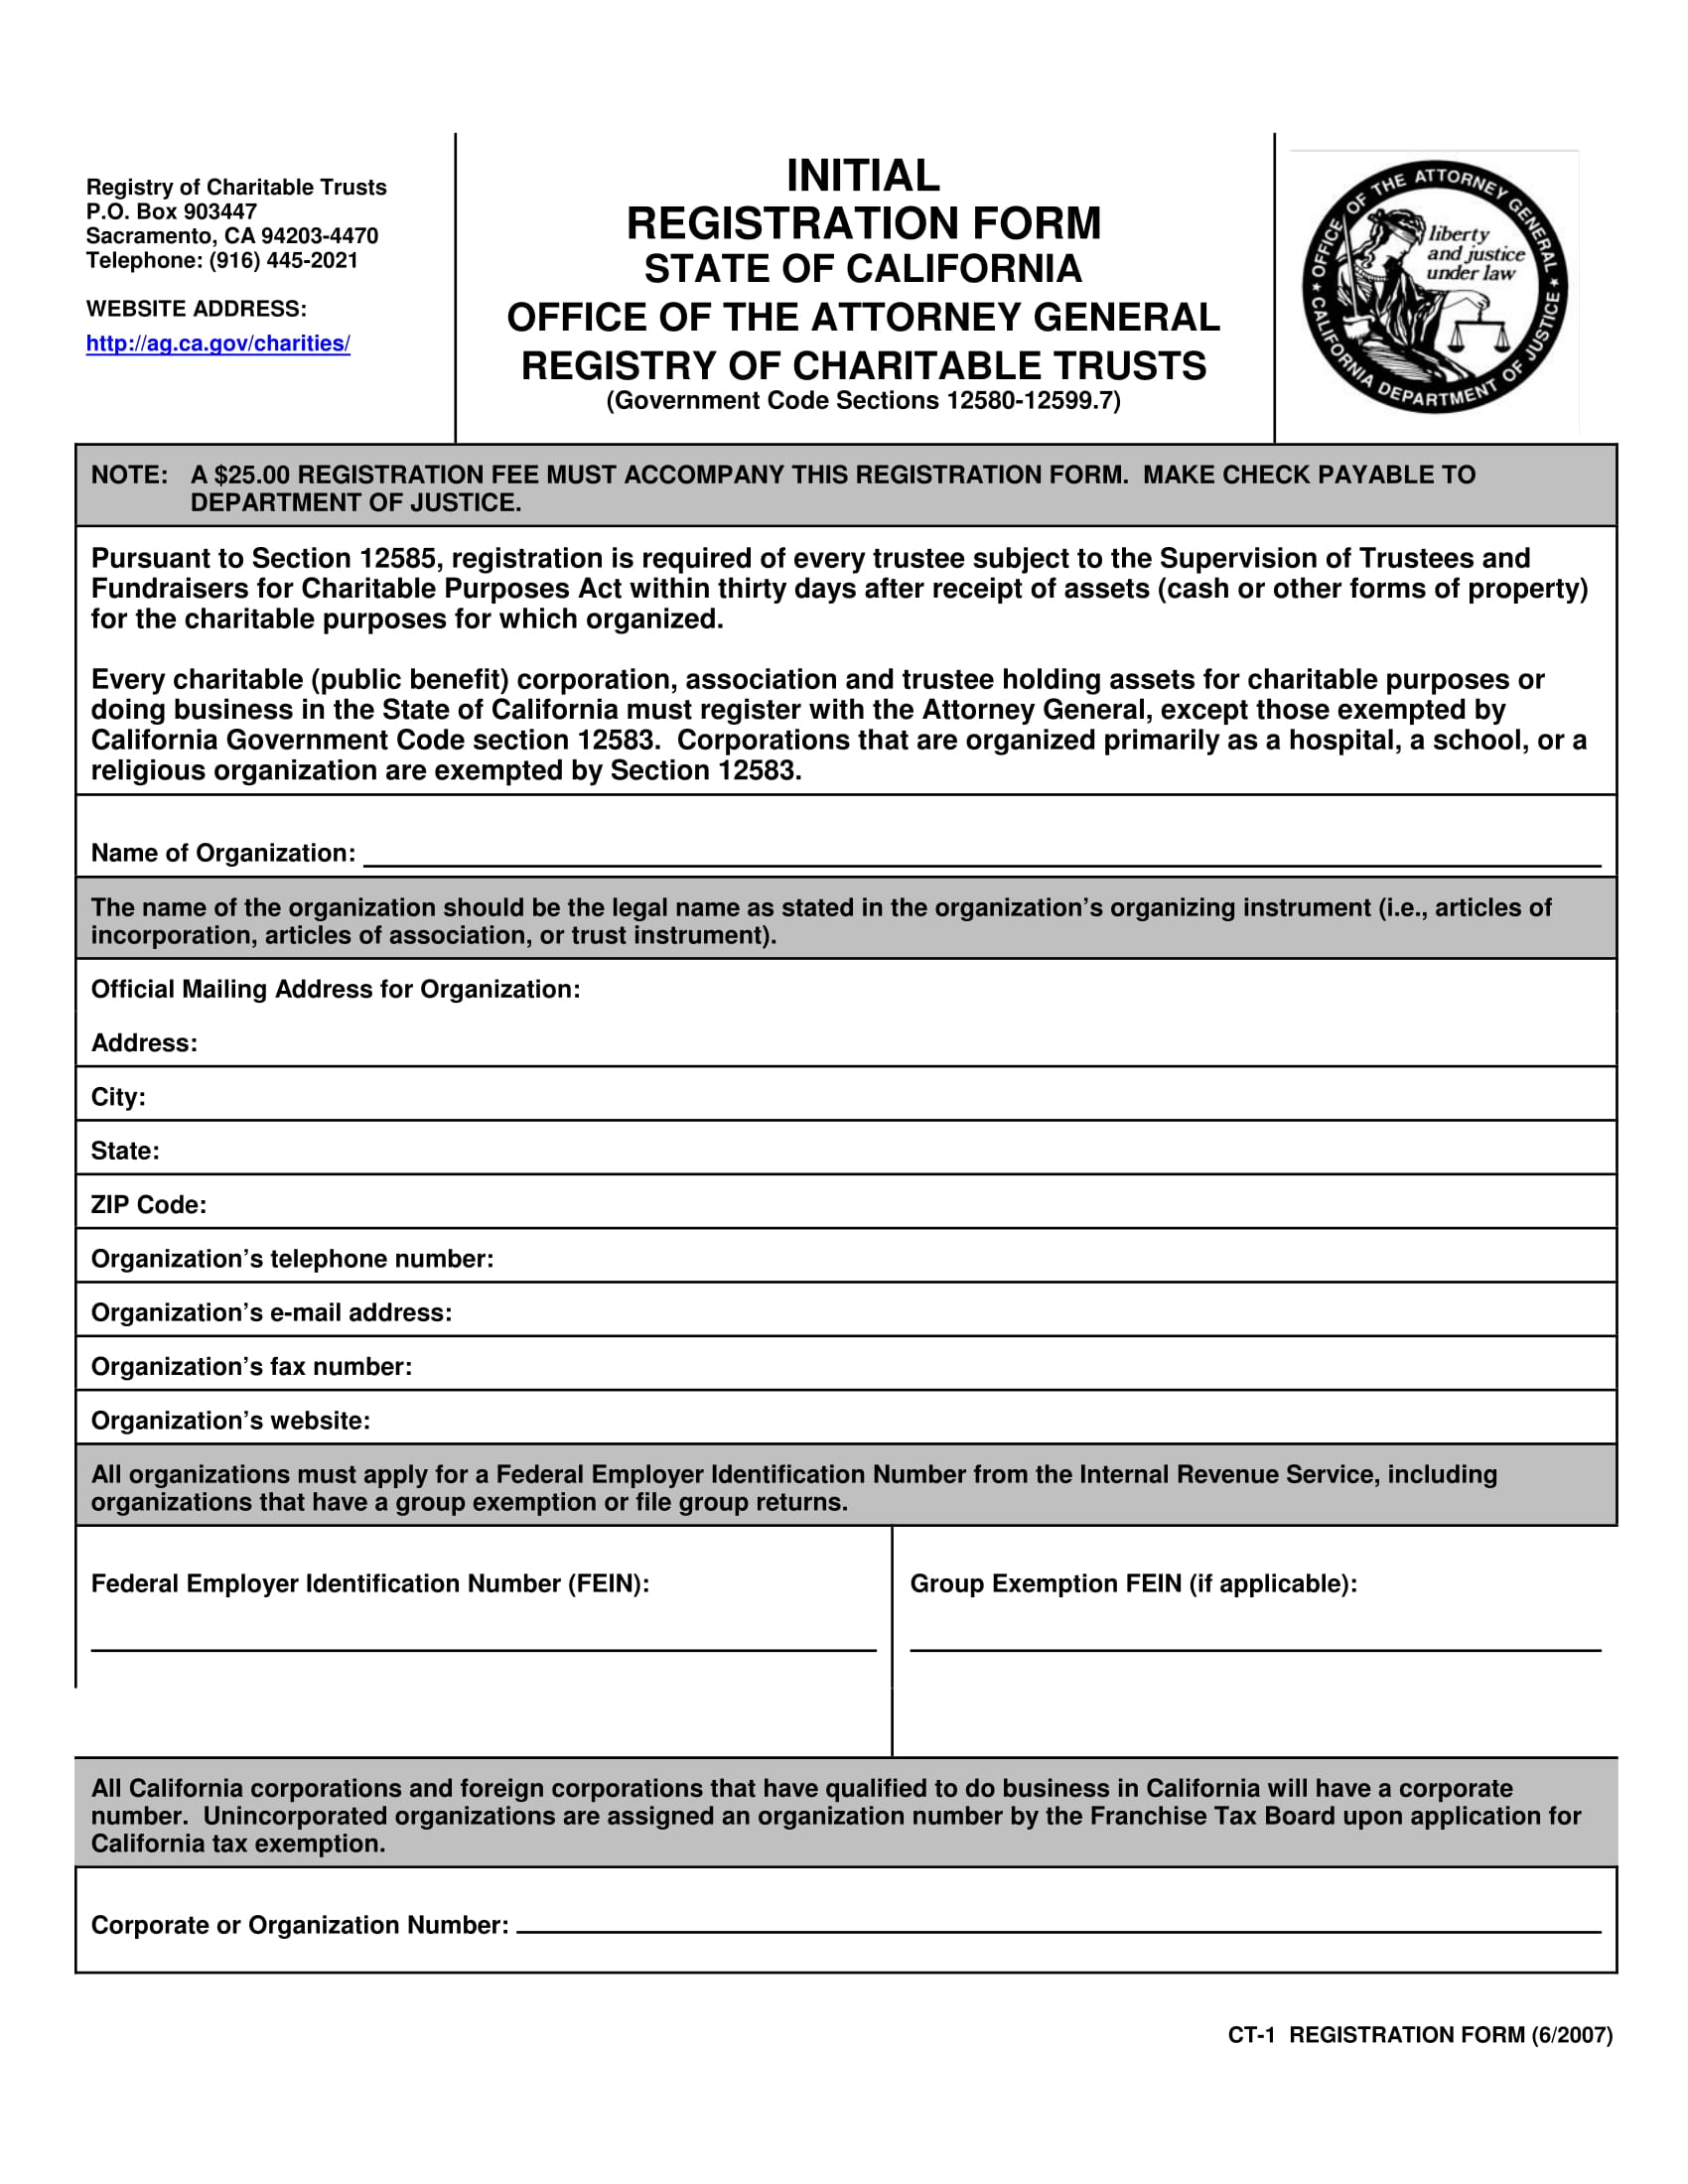 blank initial registration form 1